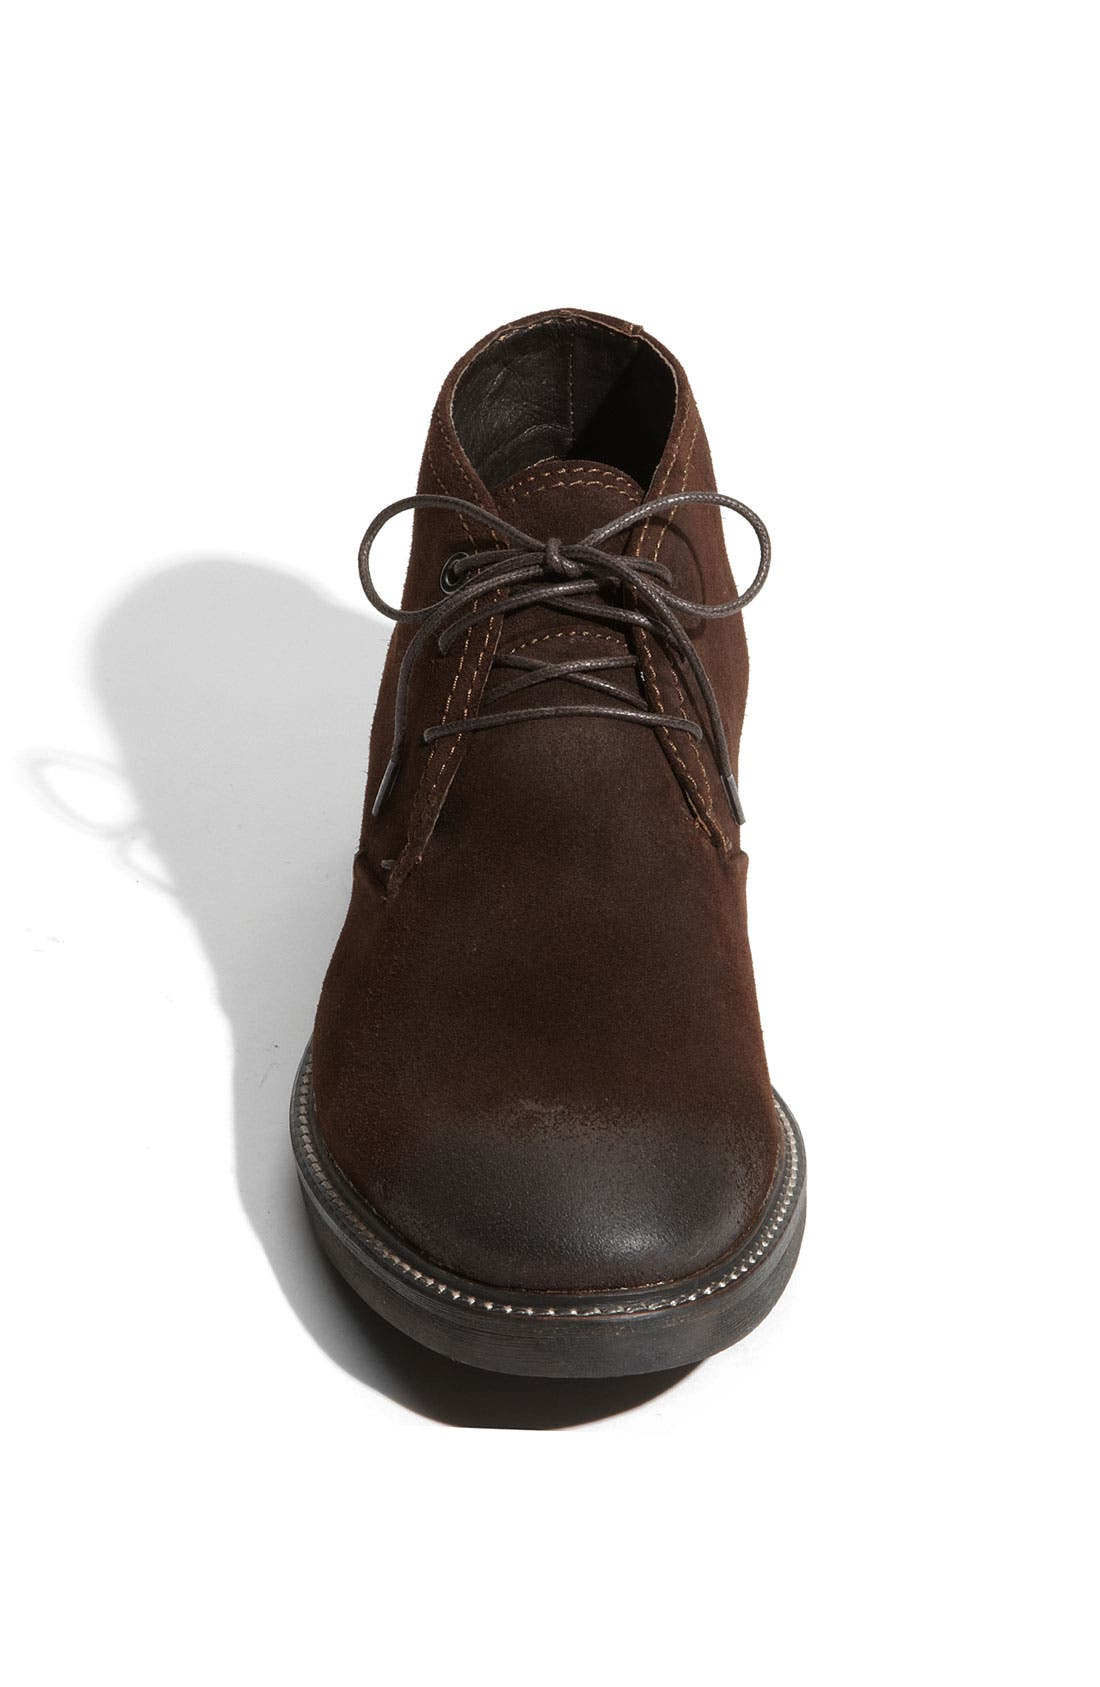 Alternate Image 3  - 1901 'Bates' Chukka Boot